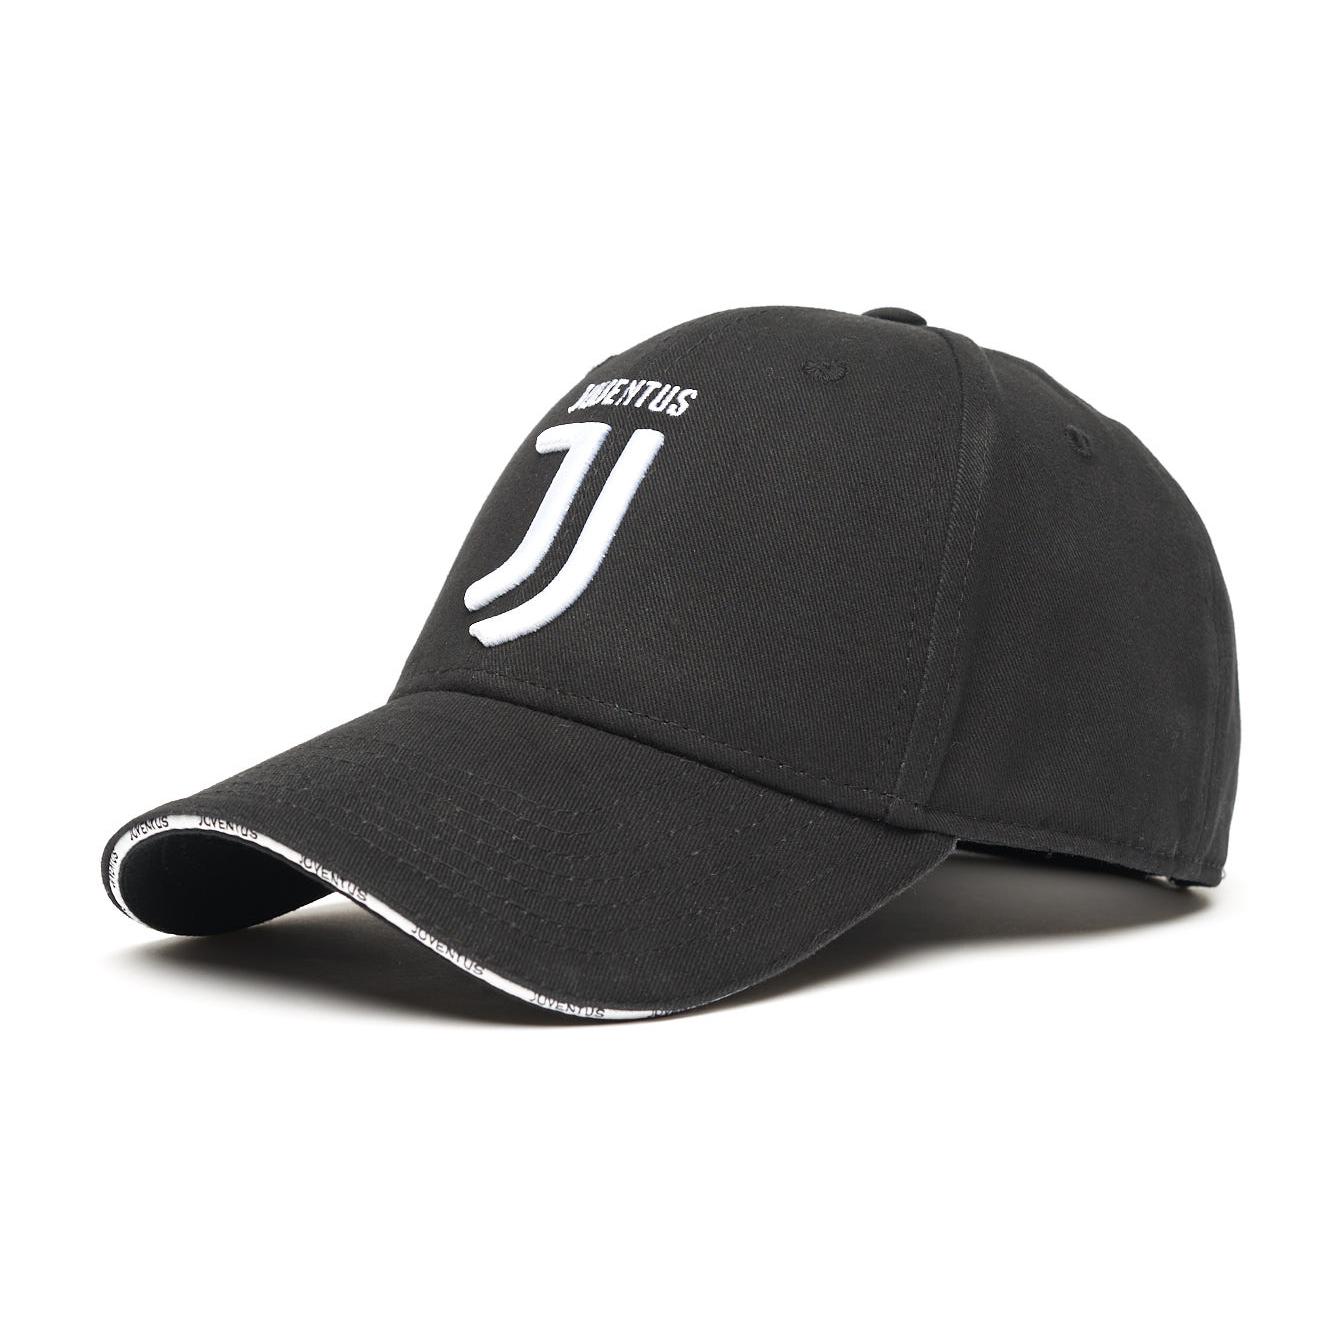 Бейсболка Ювентус 37201